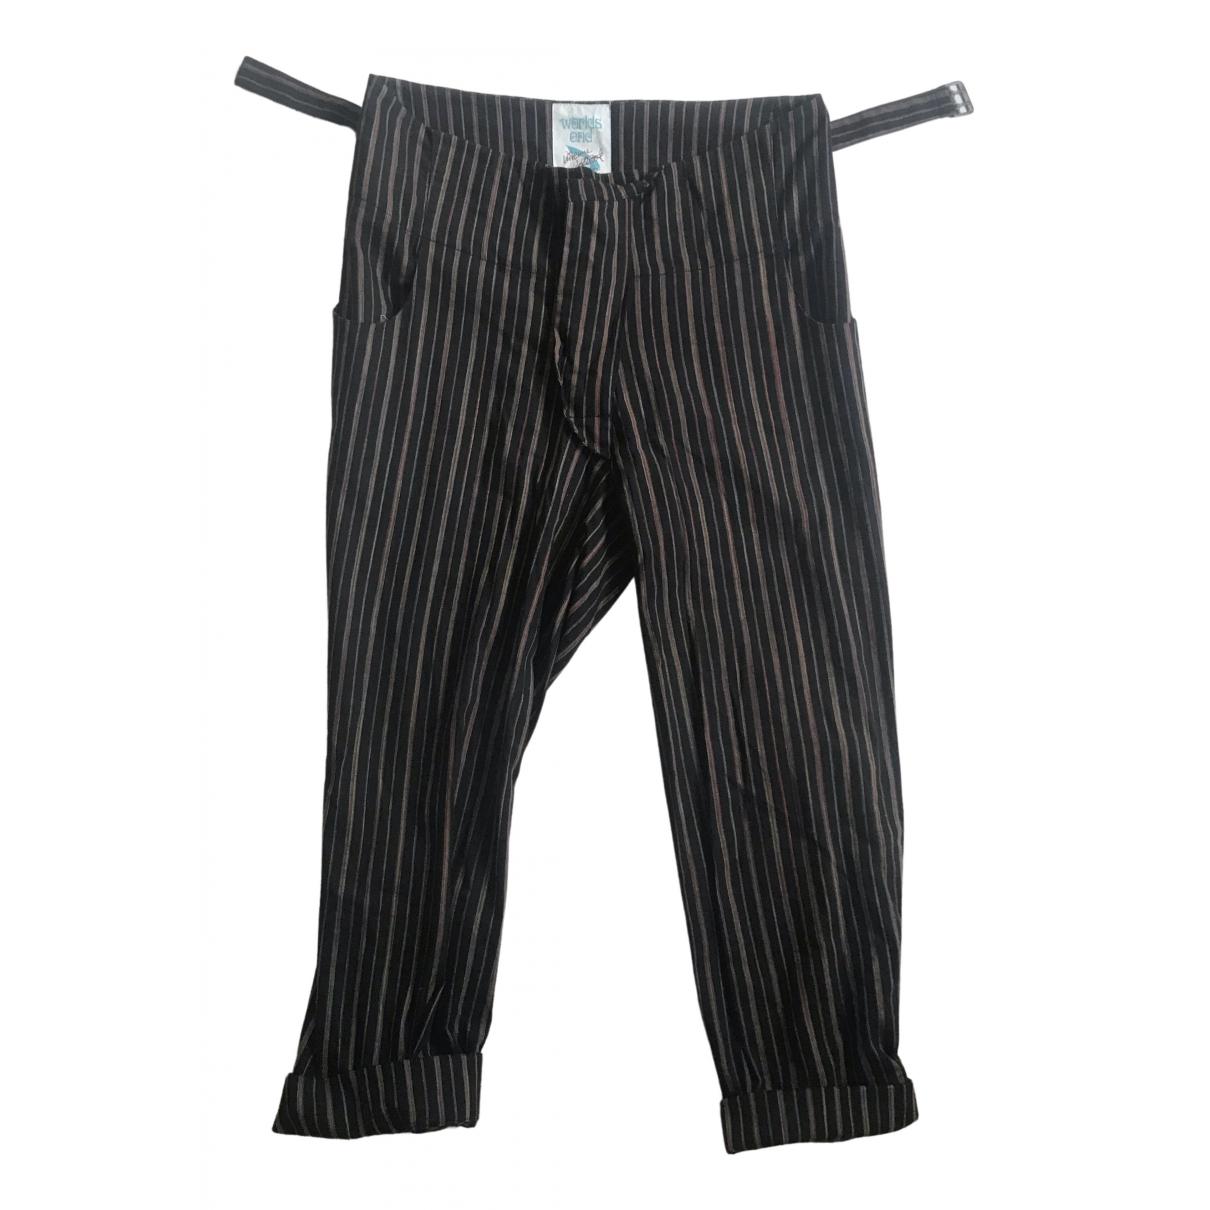 Vivienne Westwood \N Multicolour Wool Trousers for Men L International